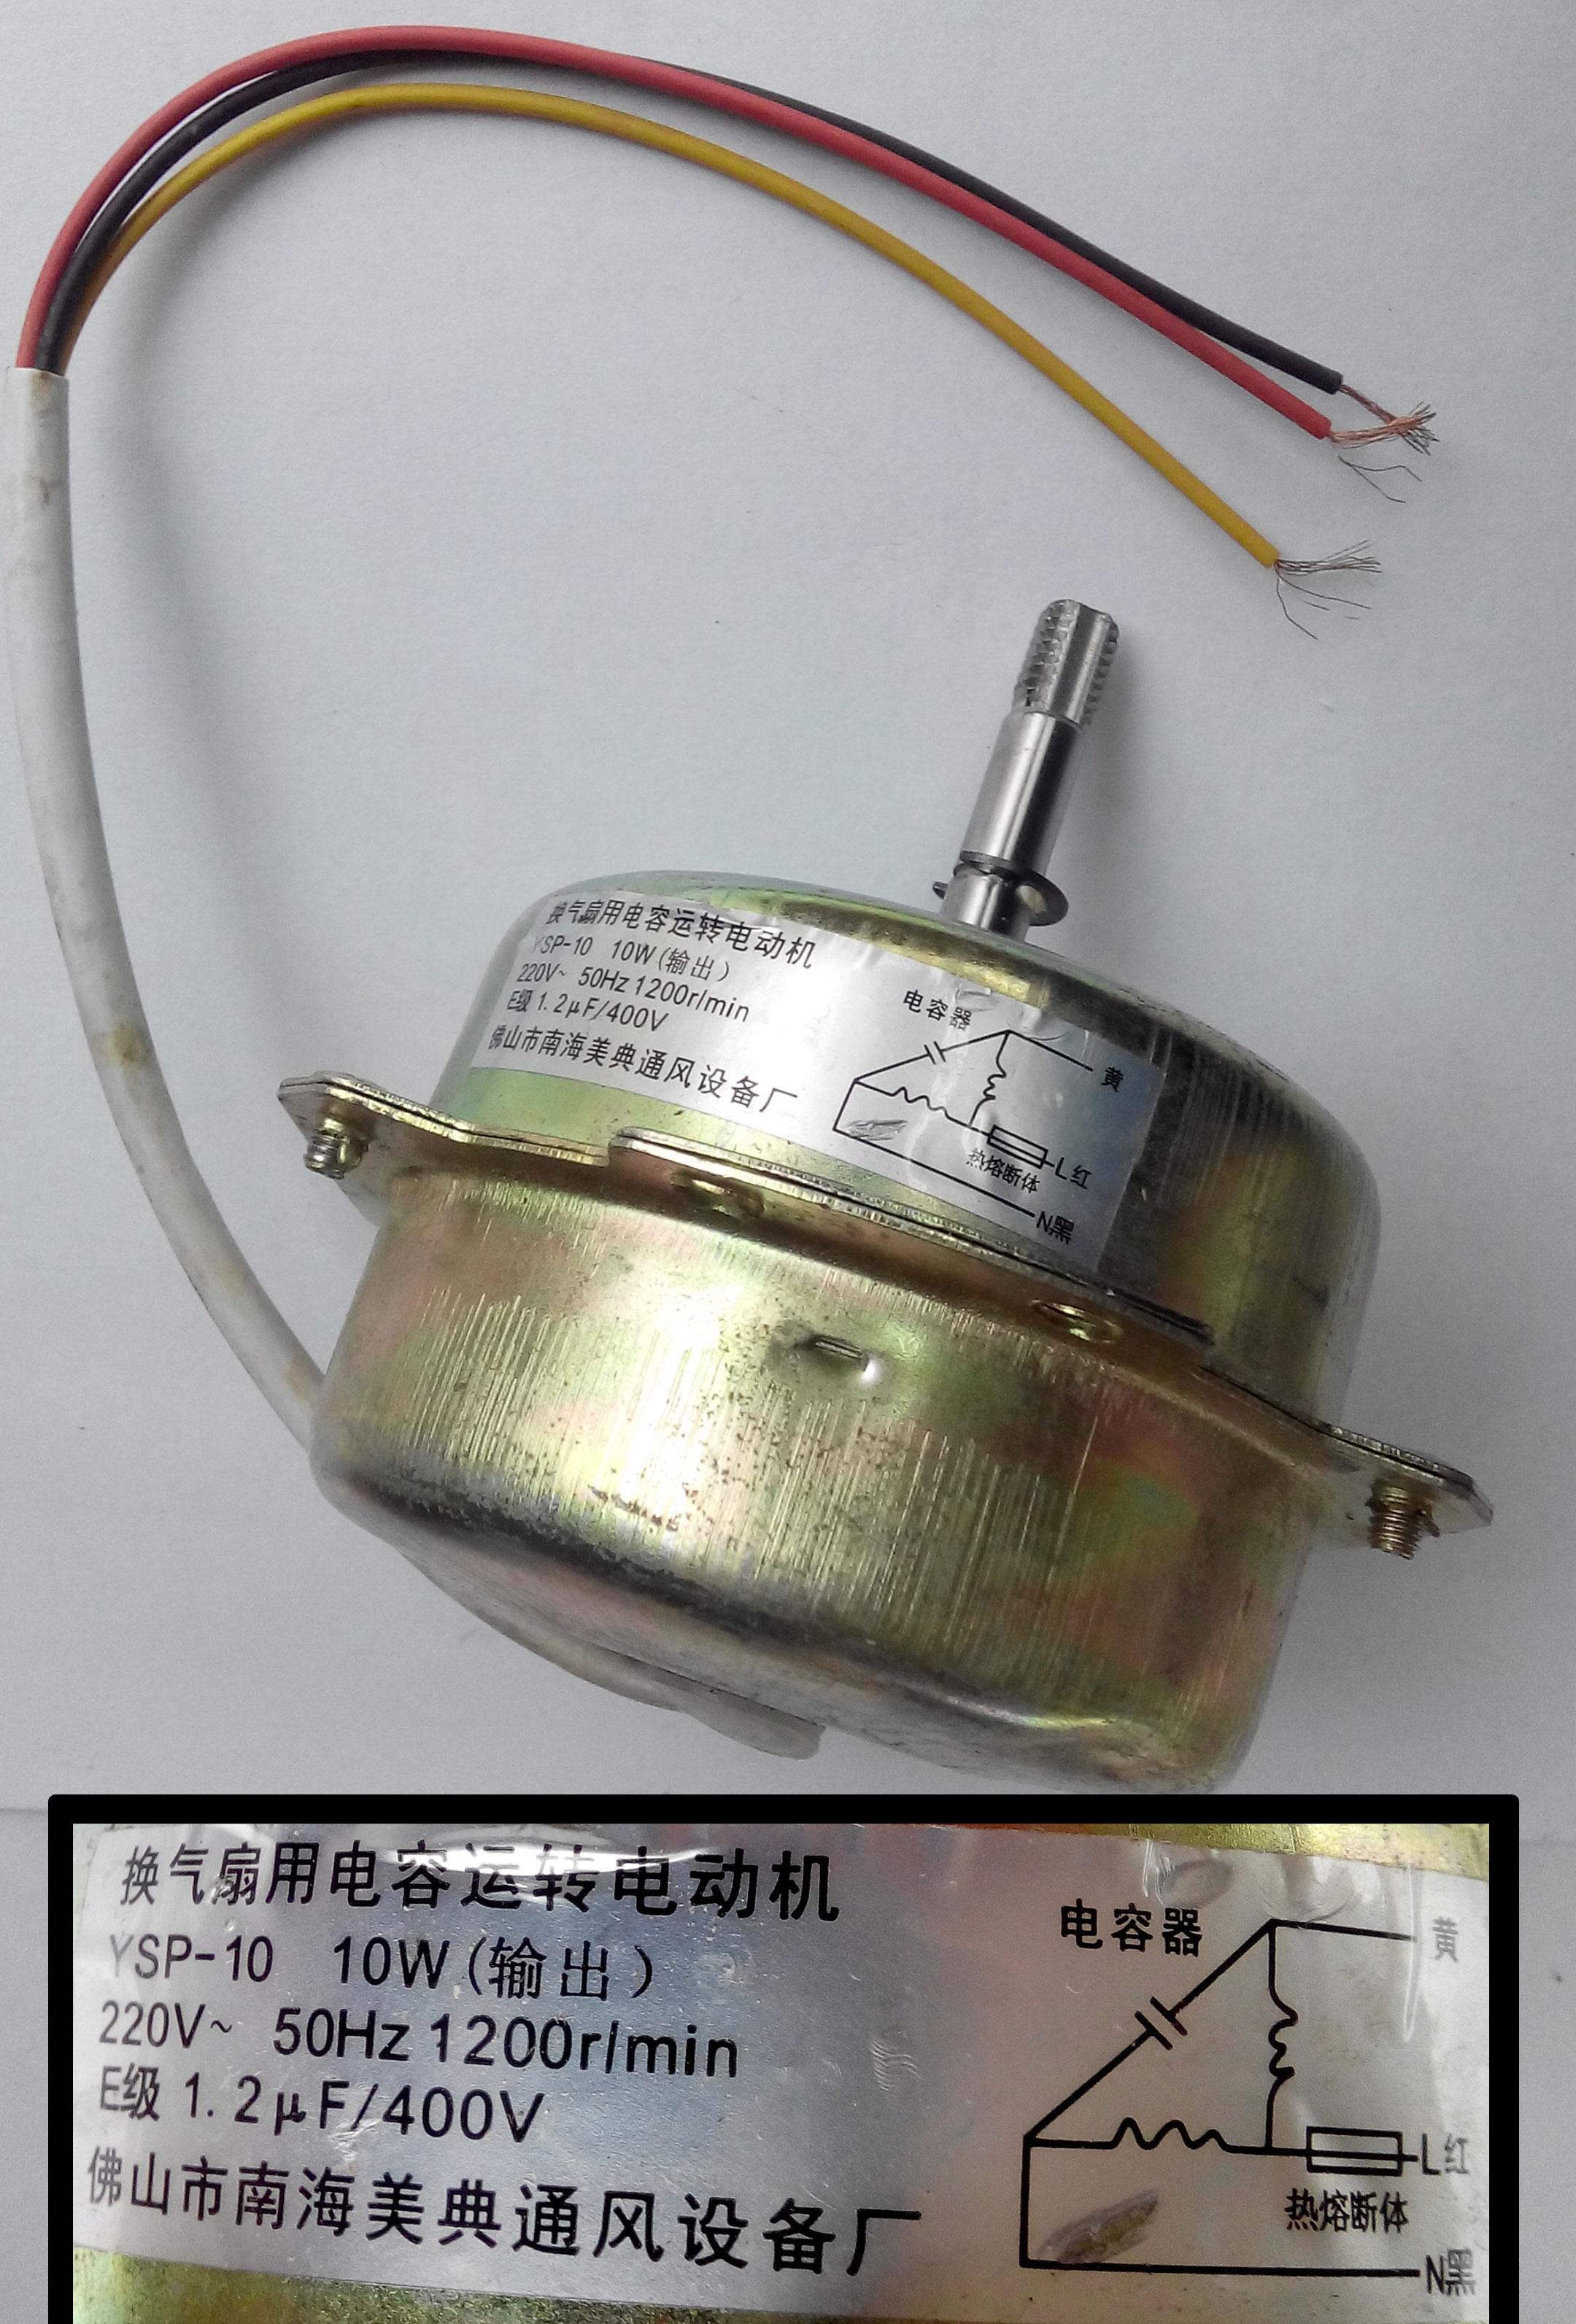 ysp-10-10w